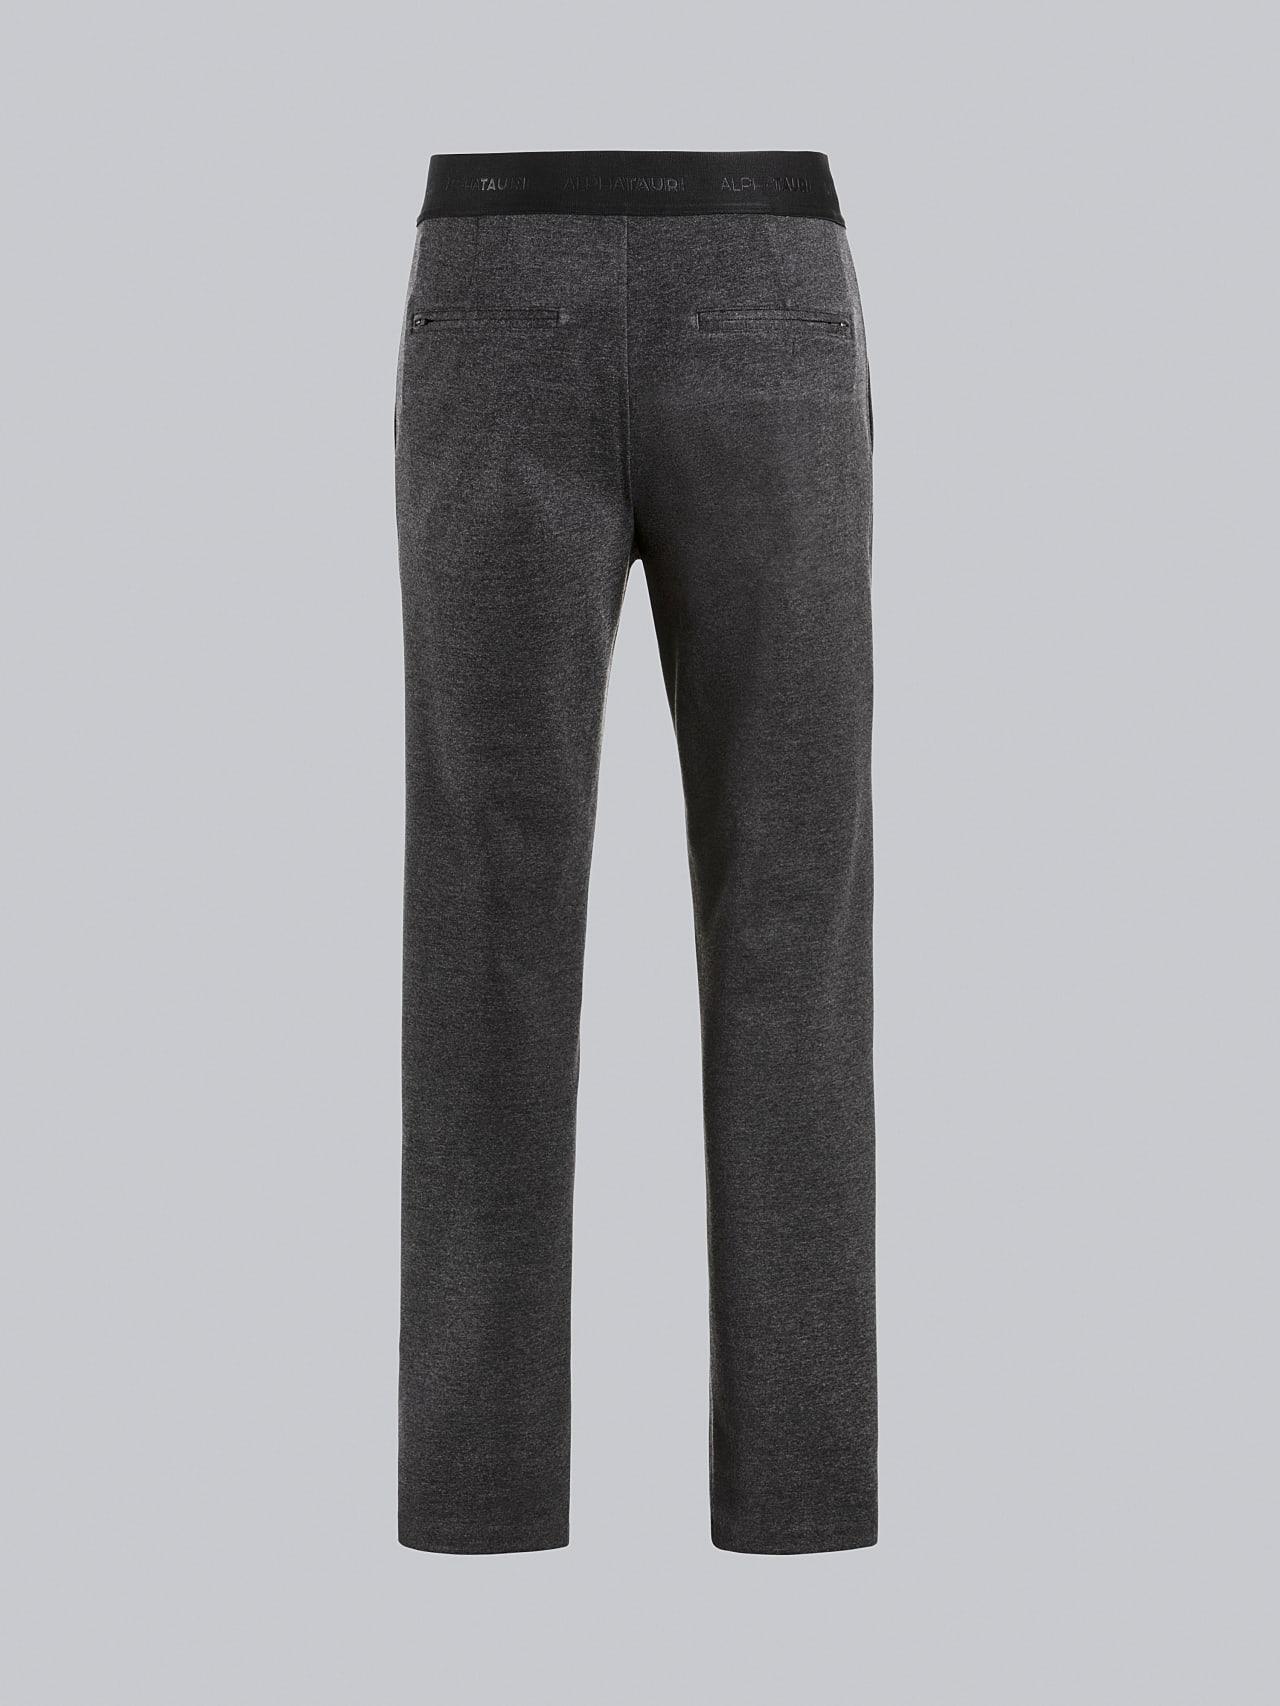 PRINO V2.Y5.02 Cropped Waterproof Sweat Pants dark grey / anthracite Left Alpha Tauri